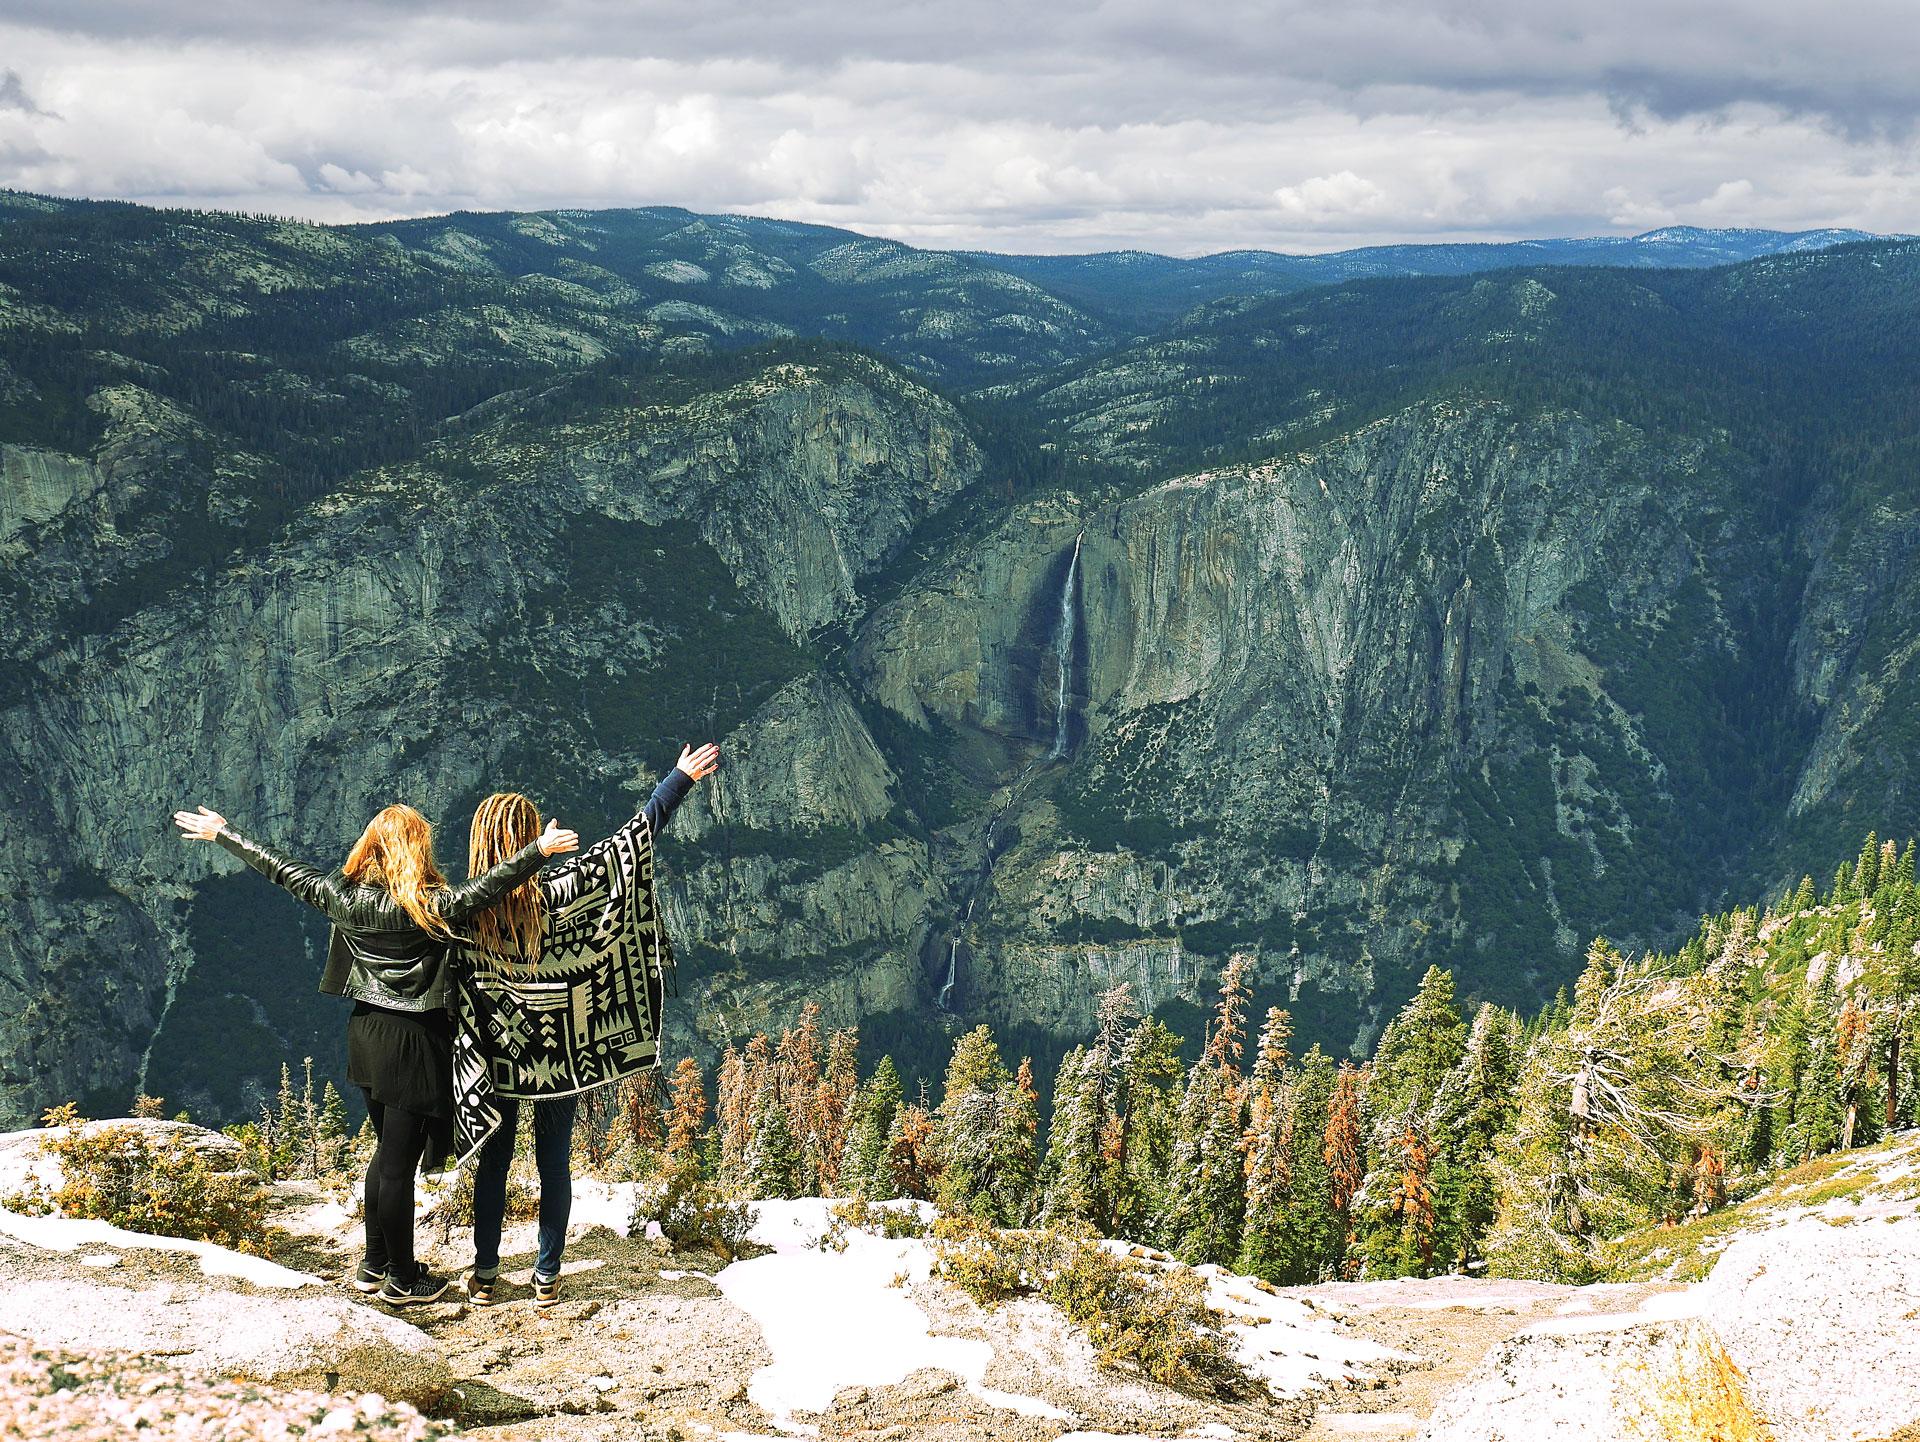 Sentinel Dome in Yosemite National Park